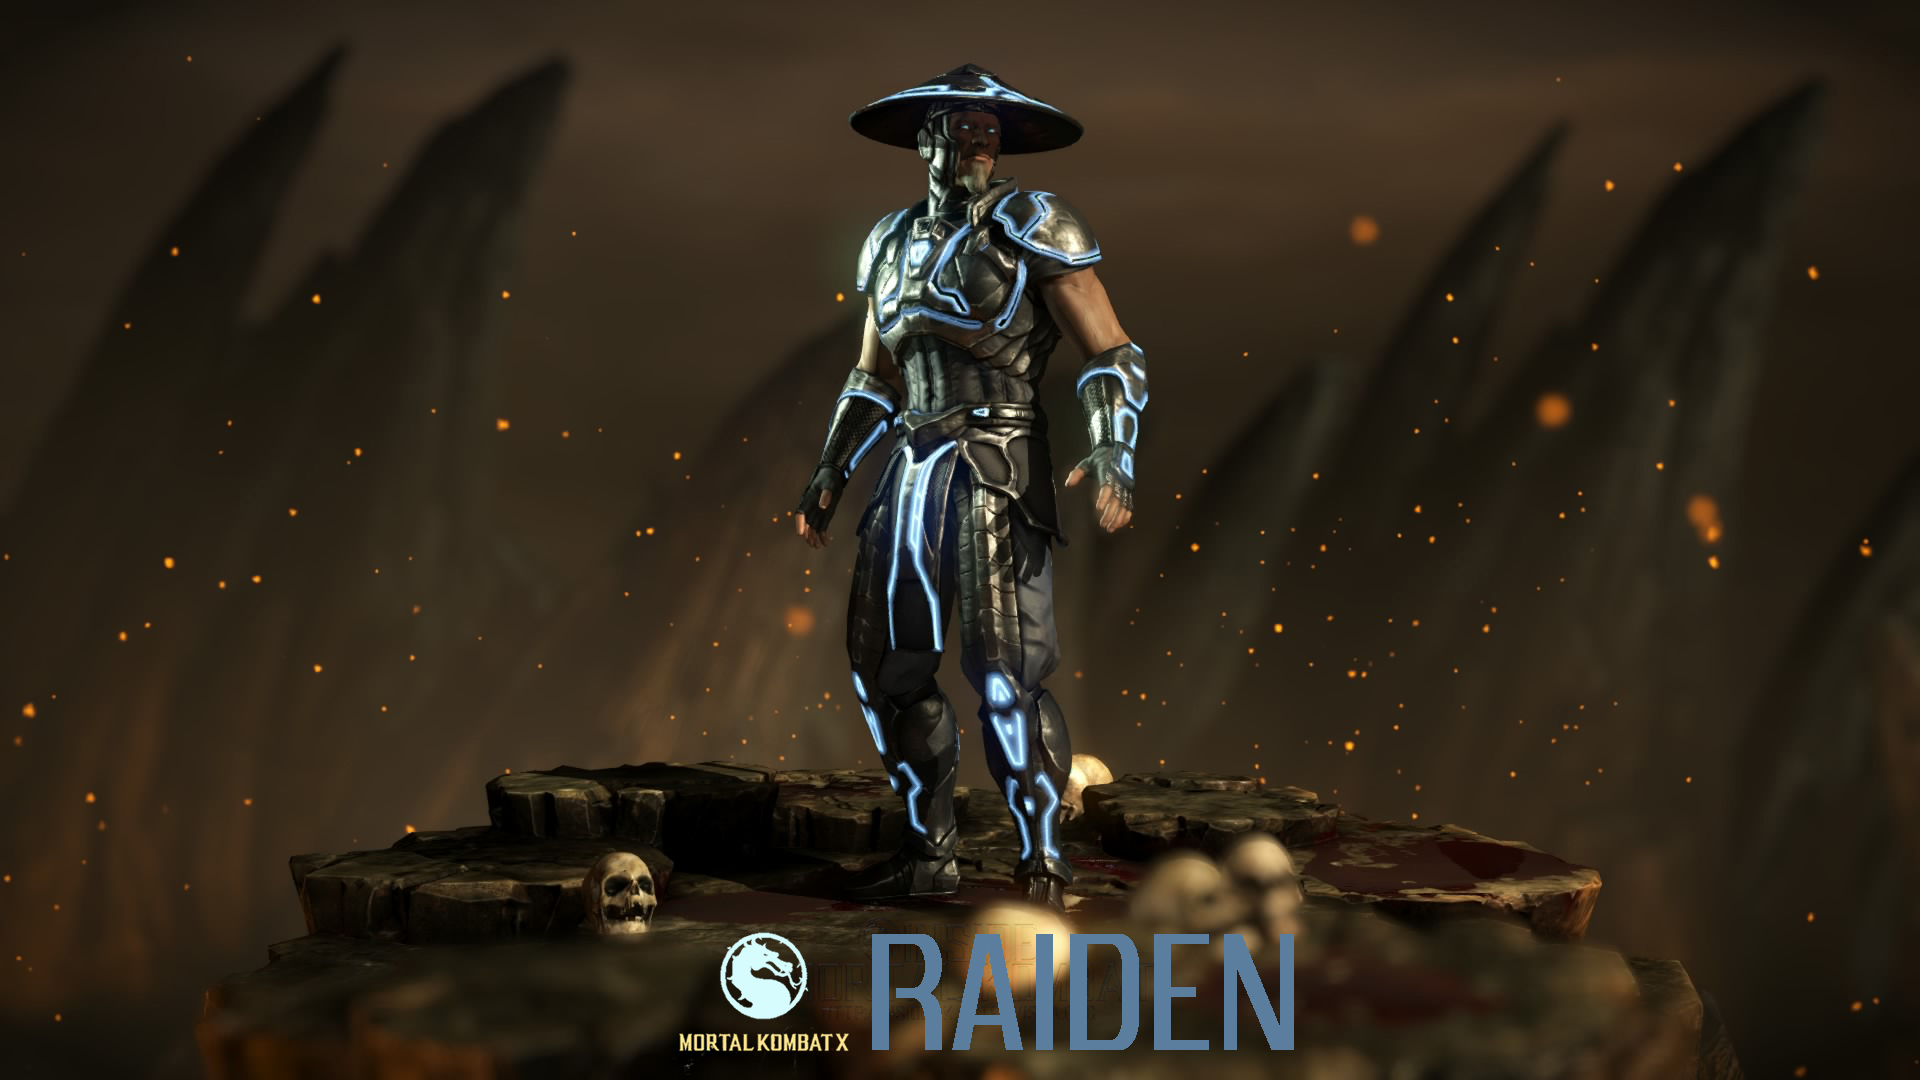 Free Download Mortal Kombat X Characters Raiden Wallpaper Hd